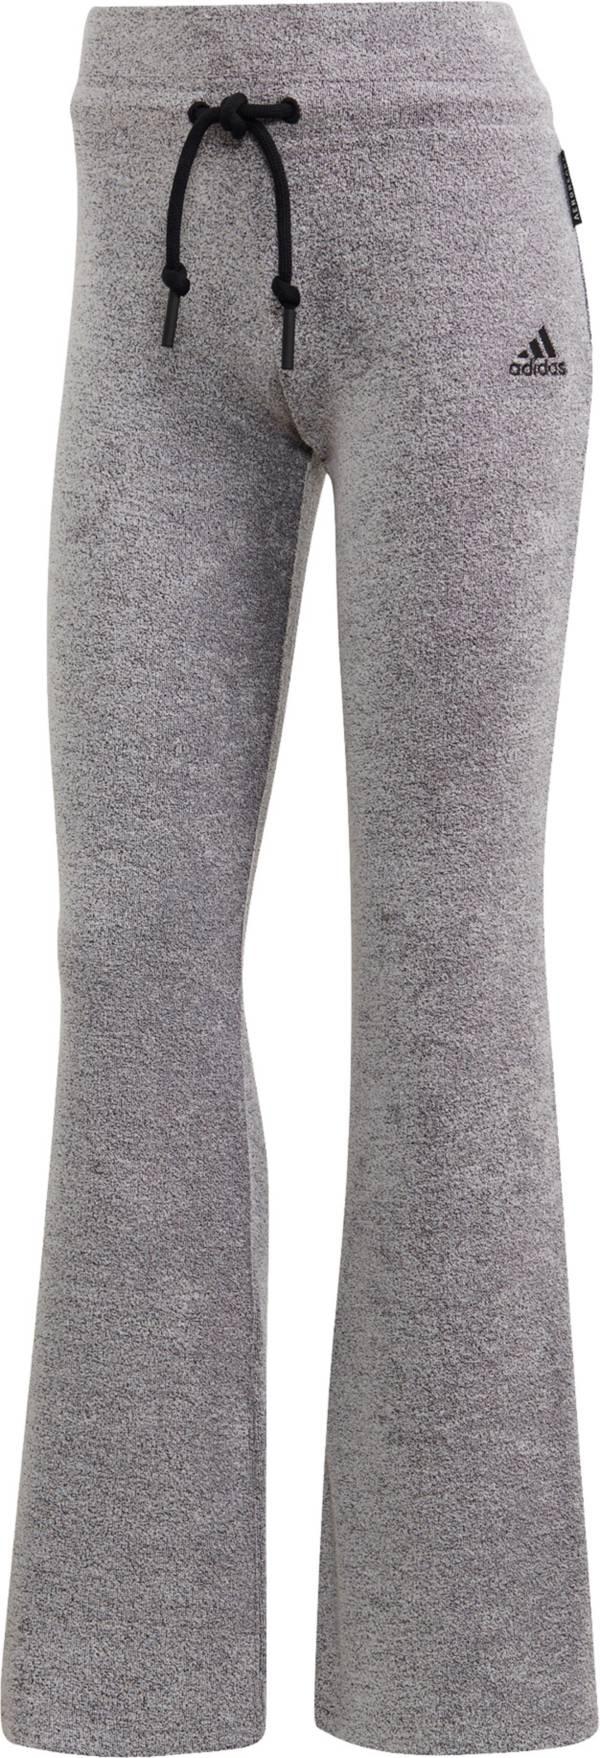 adidas Women's Lightweight Pants product image